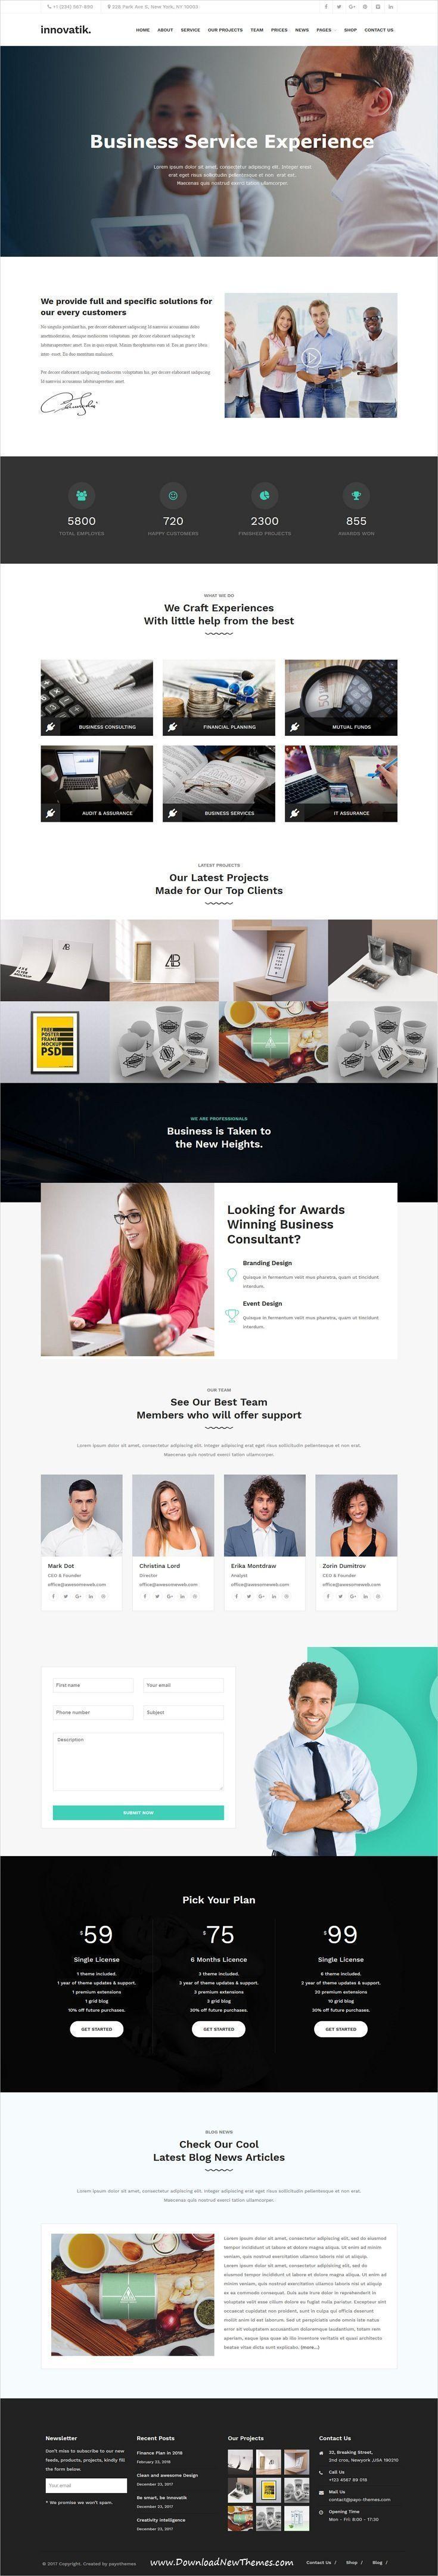 7101 besten Office designs Bilder auf Pinterest   Büro ideen, Büro ...